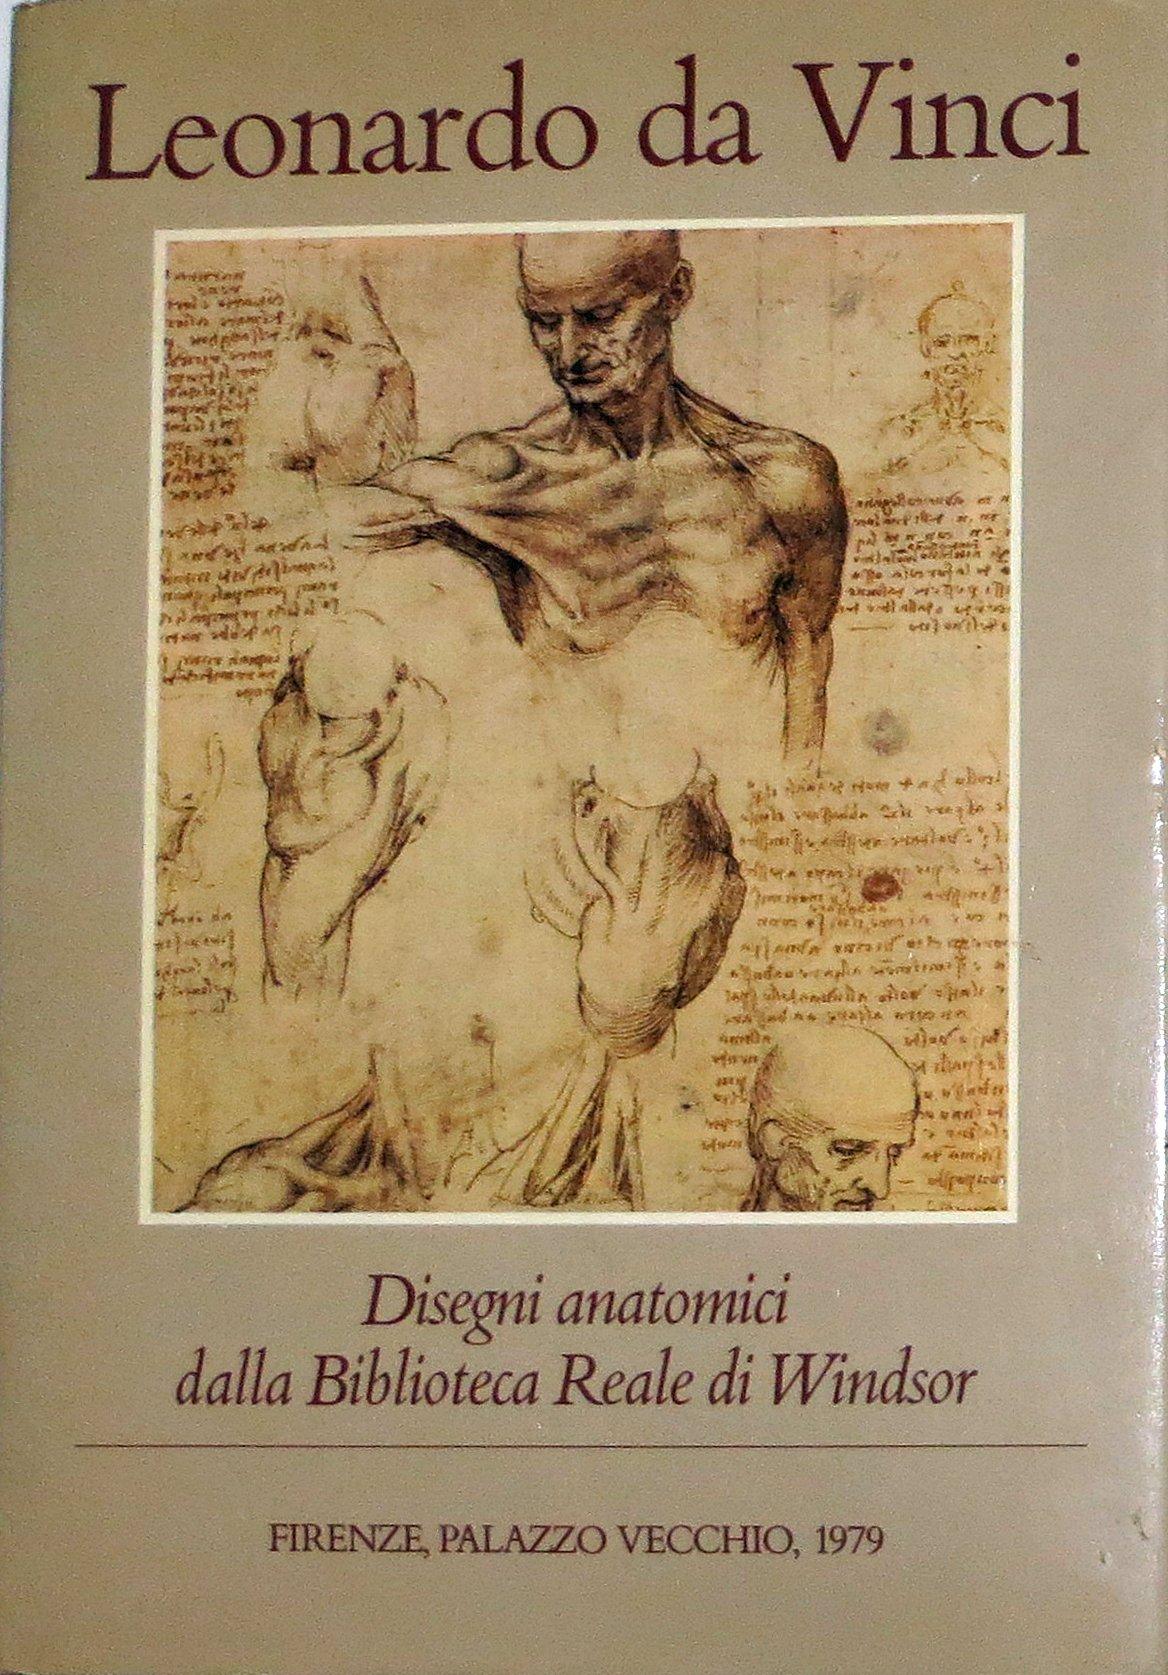 leonardo da vinci disegni anatomici dalla biblioteca reale di windsor